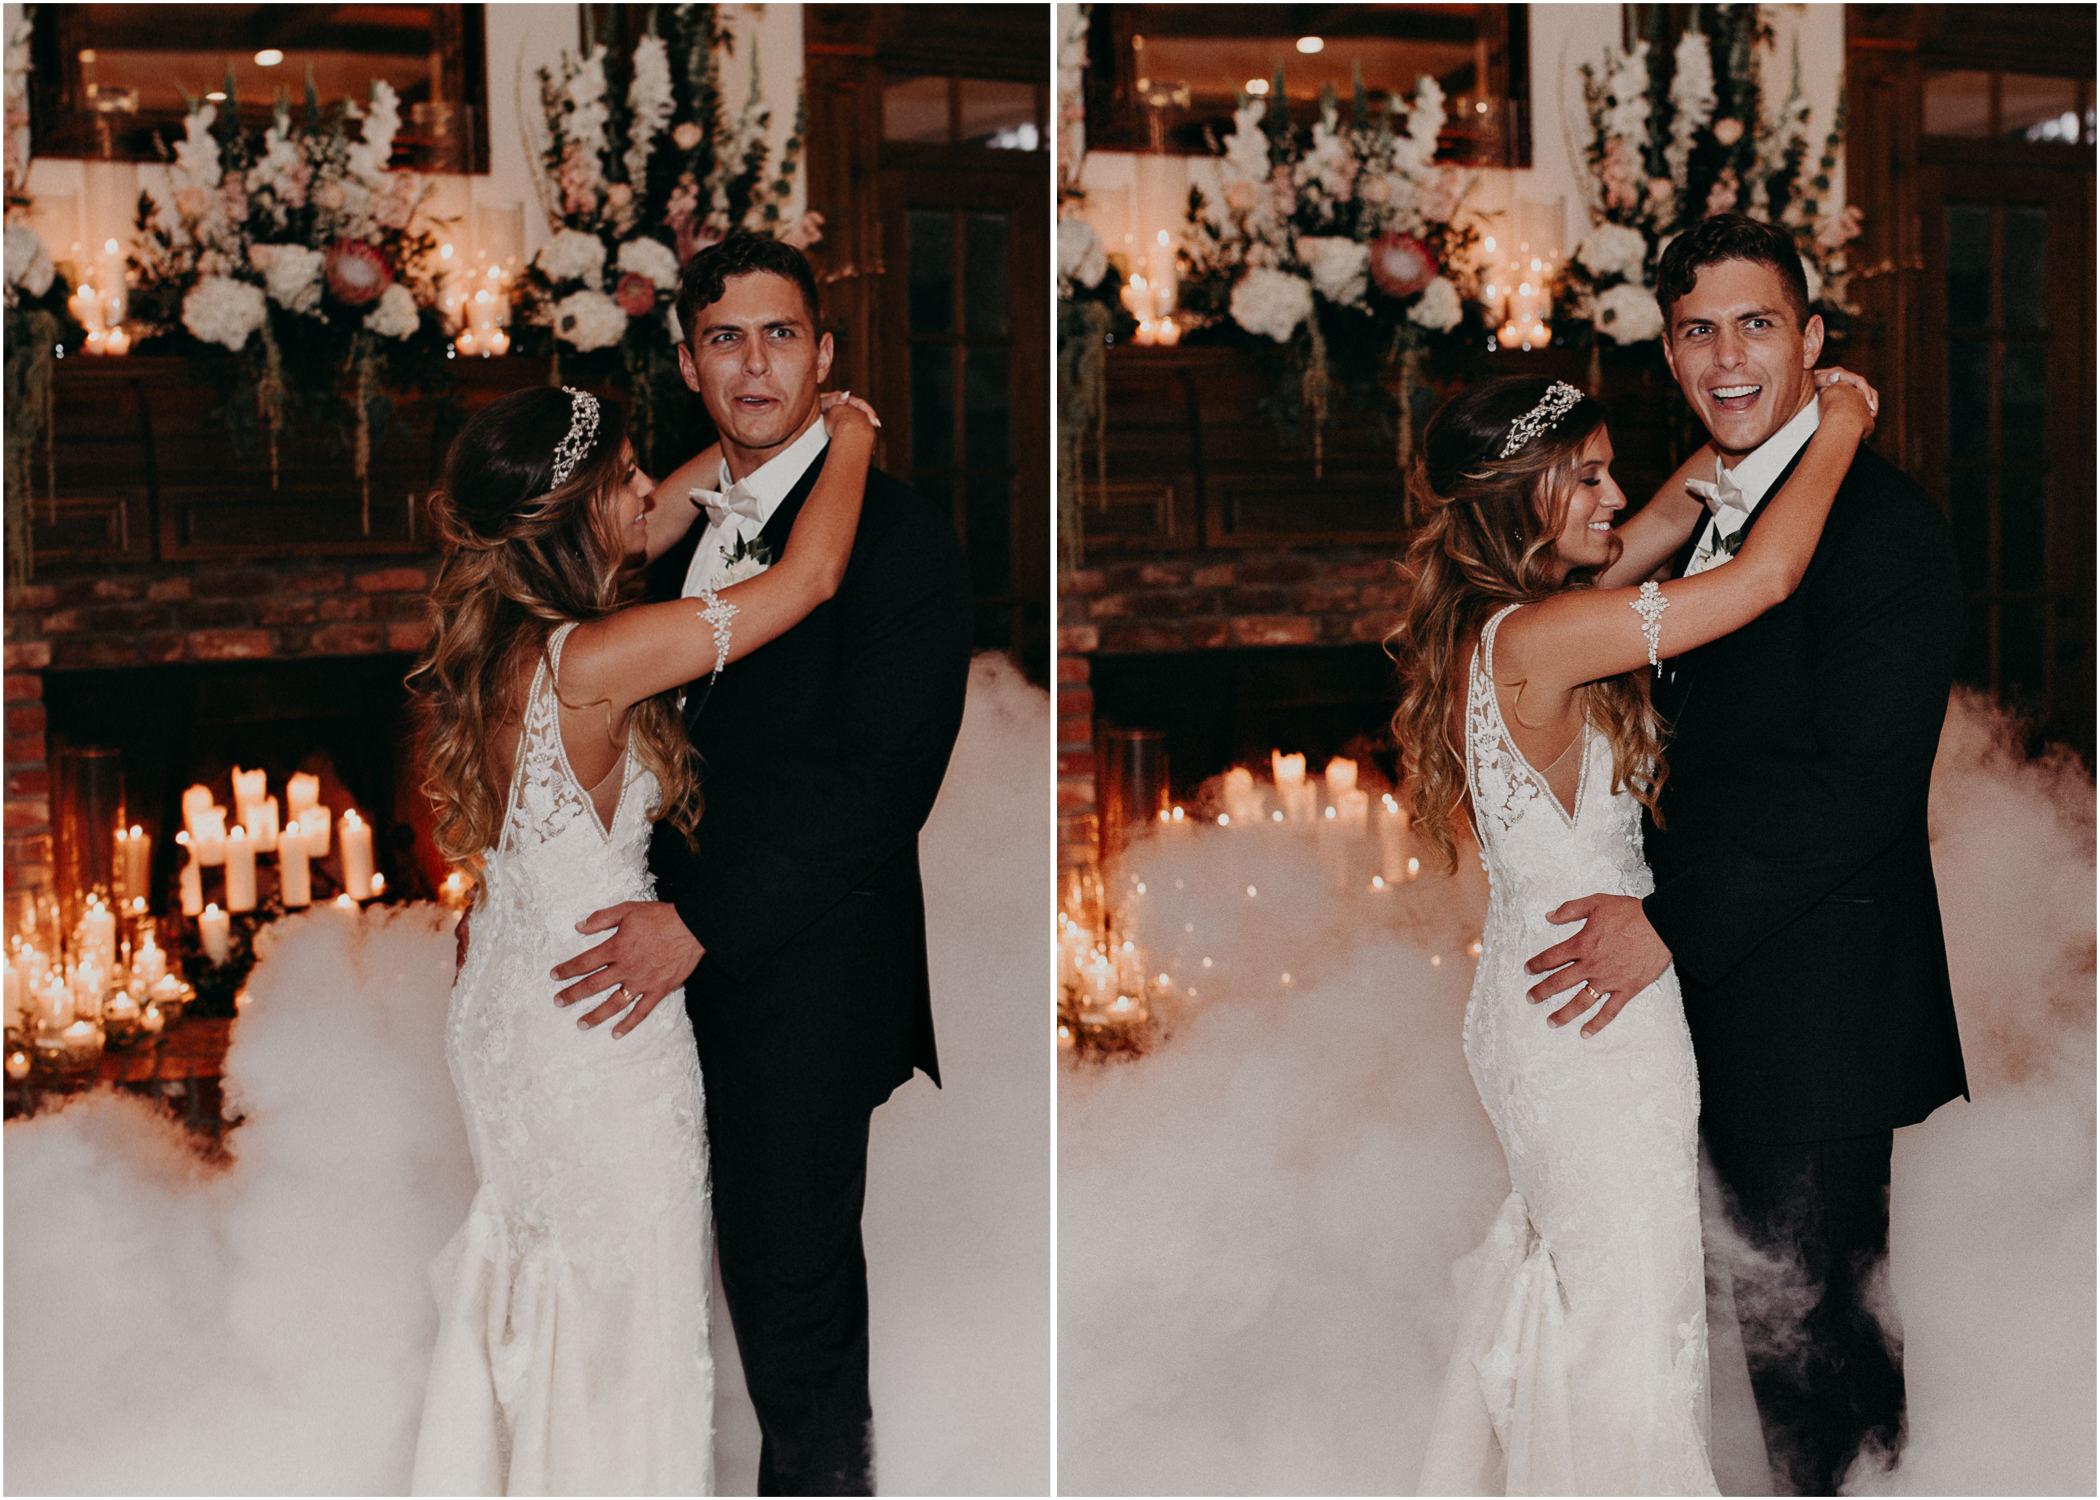 91Carl House Wedding Venue Ga, Atlanta Wedding Photographer - Boho, Bohemian, Junebug Weddings, Vintage, Retro, Trendy. Aline Marin Photography. .jpg